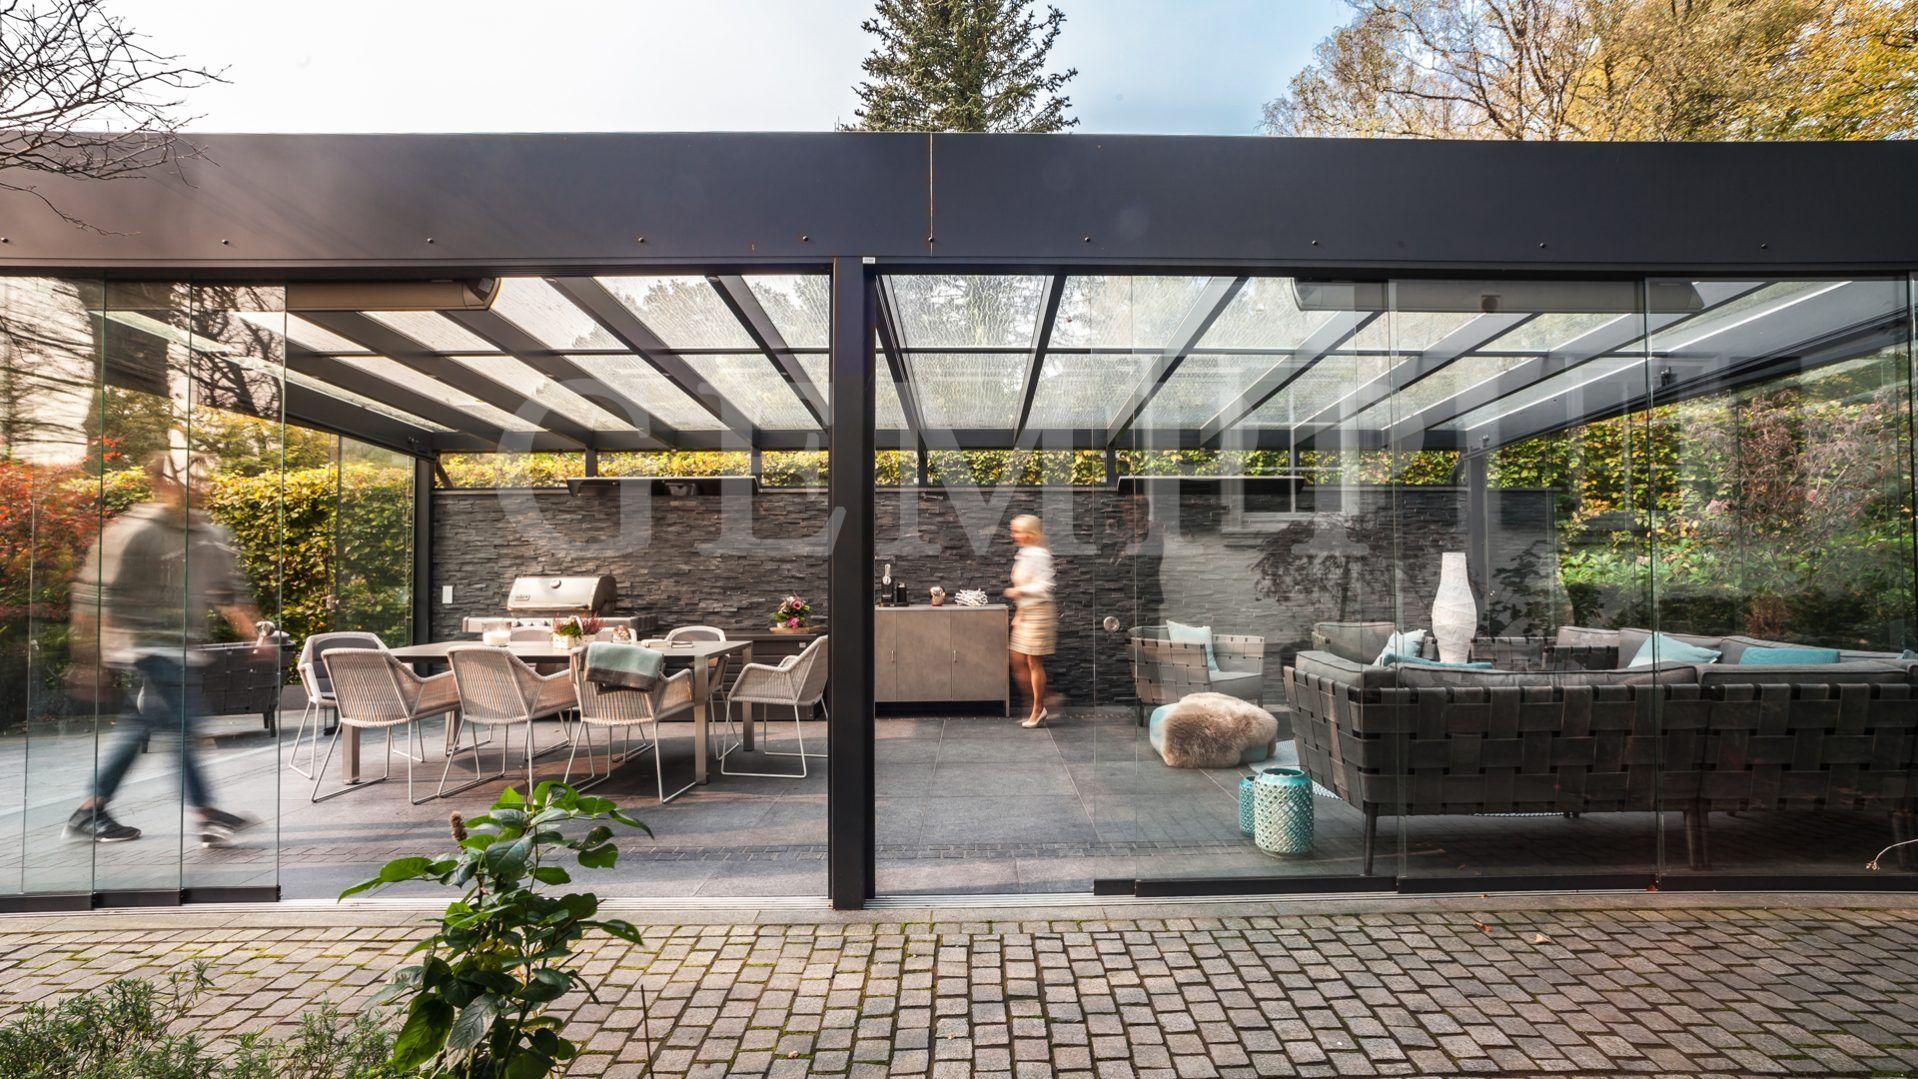 Gartenplanung Hamburg moderne terrassenüberdachung gartenplanung gartengestaltung für